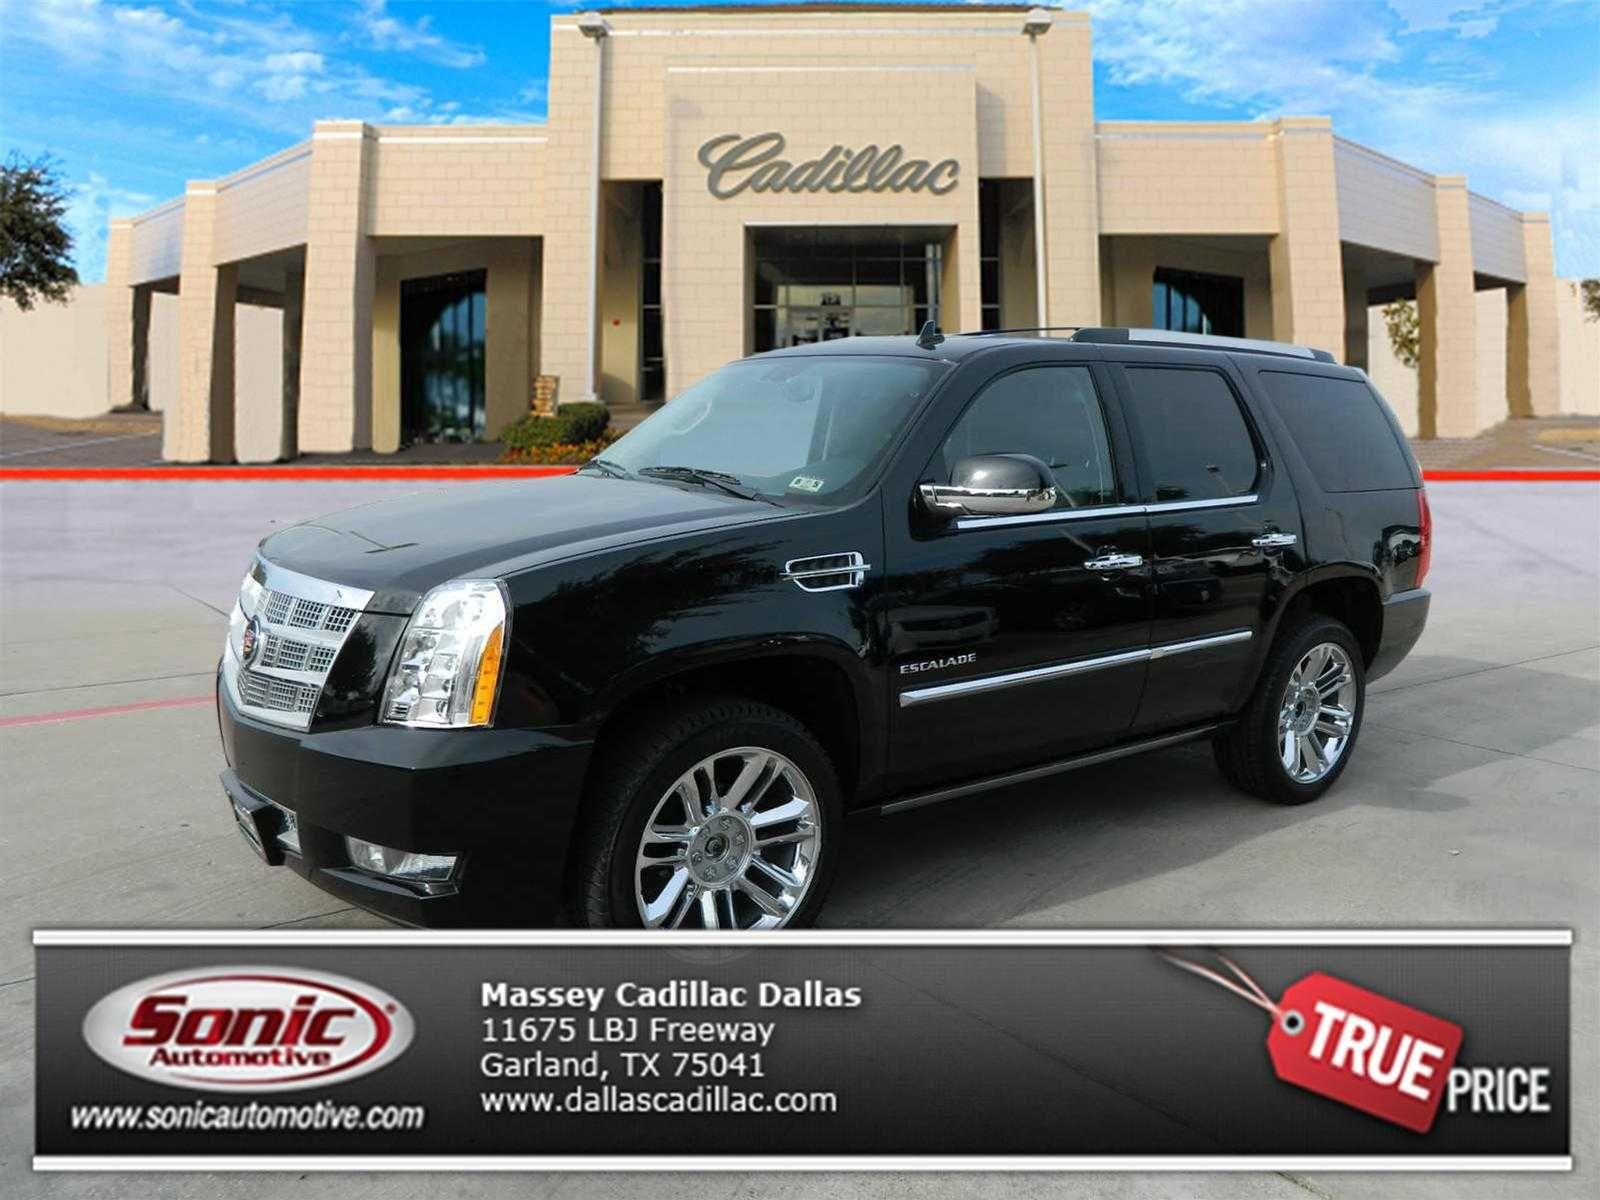 New CADILLAC ESCALADE Platinum ForSale Dallas Plano - Cadillac dealership in dallas tx